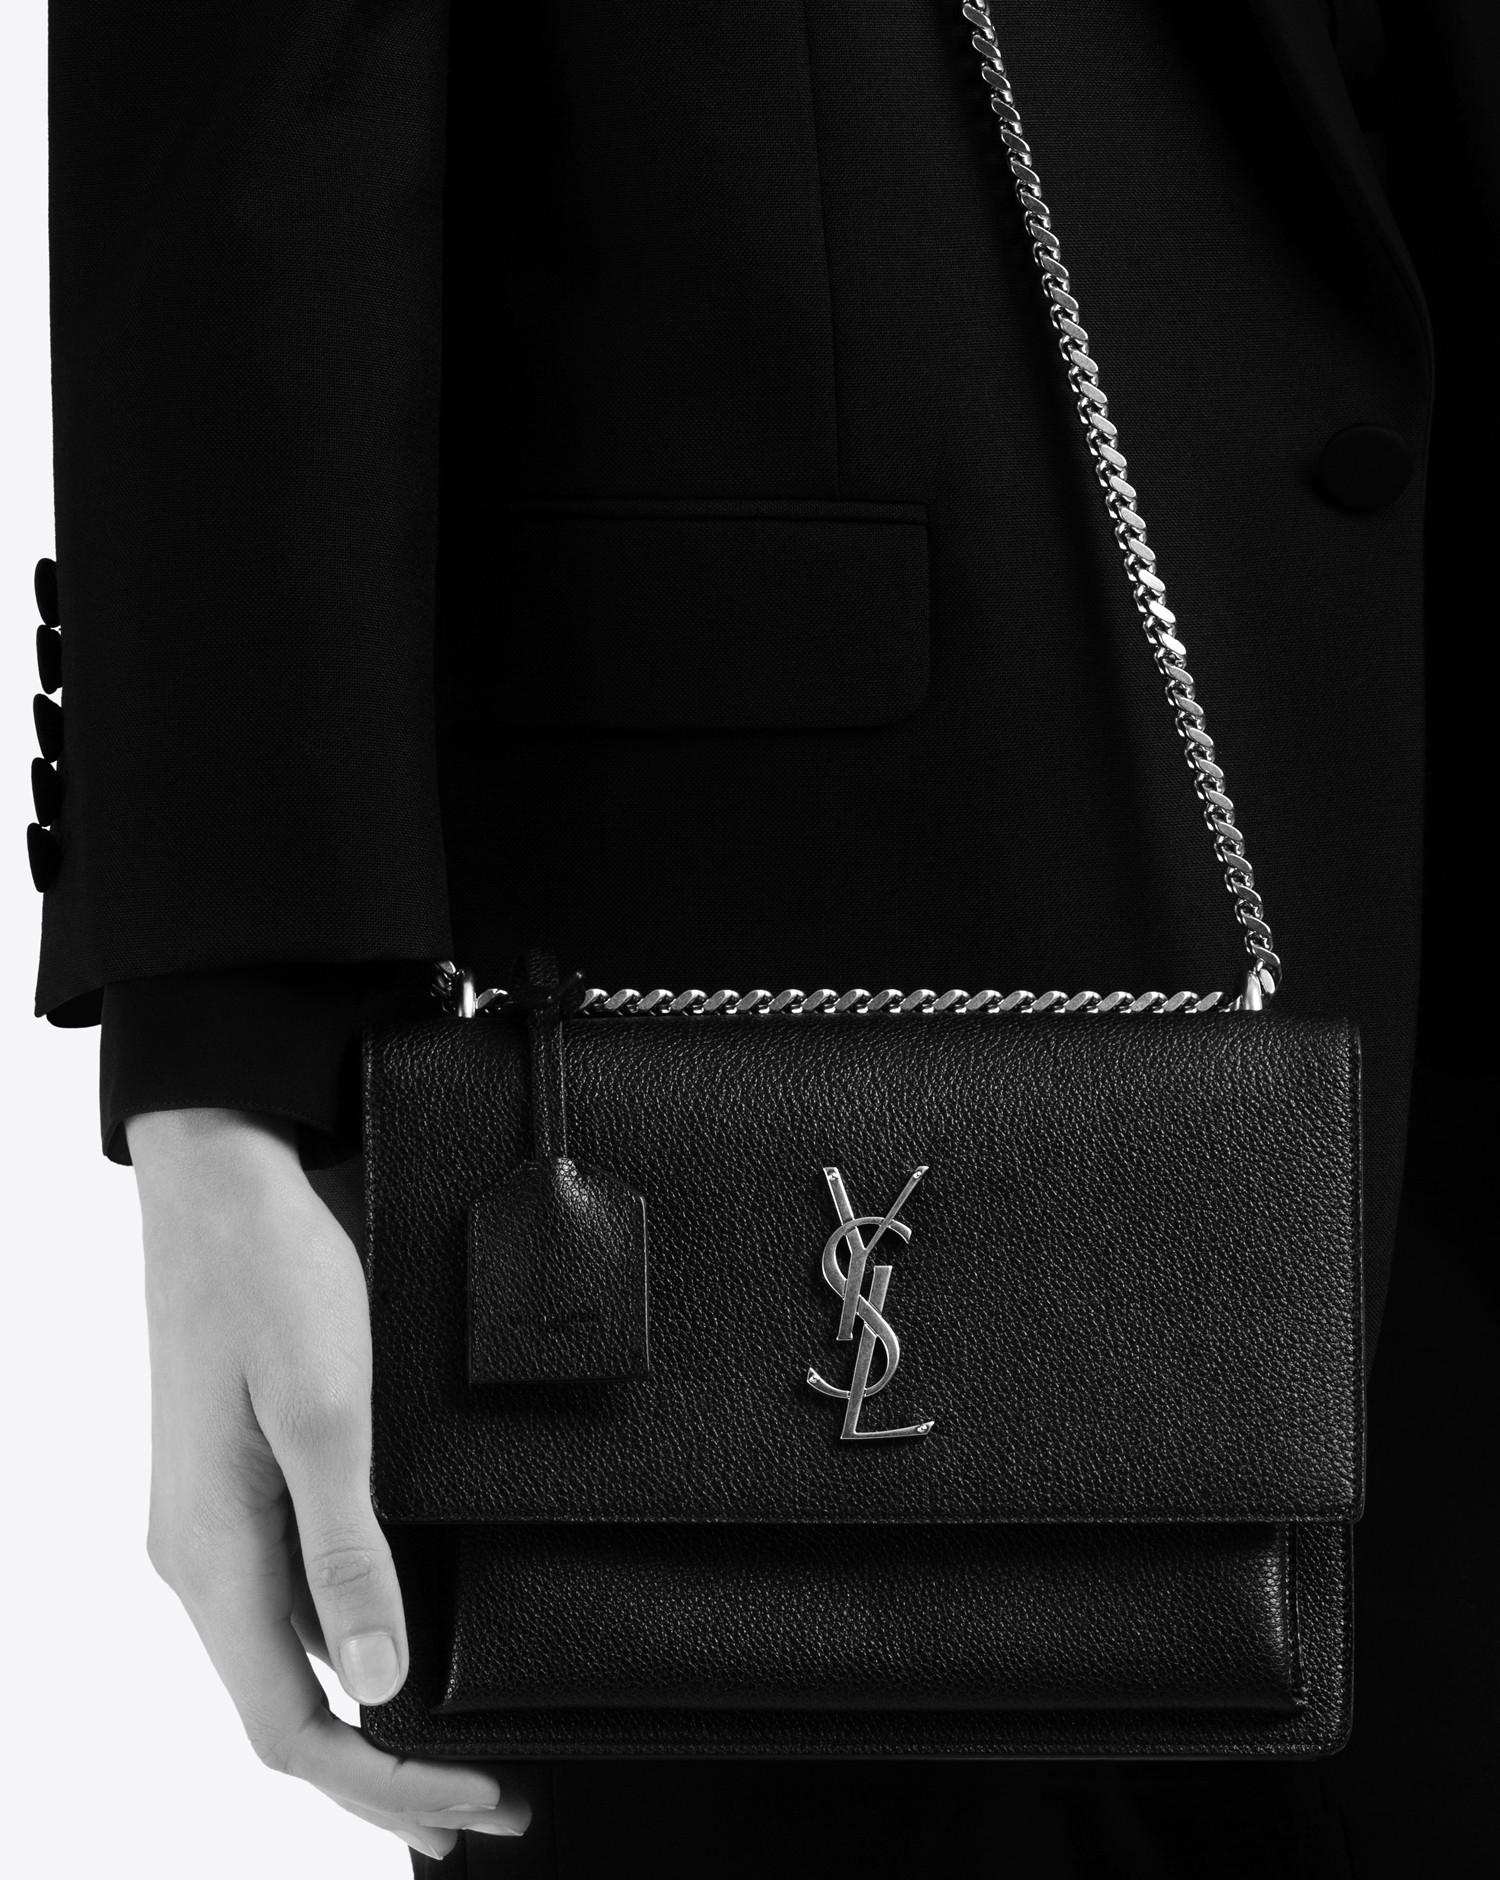 Lyst - Saint Laurent Medium Sunset Monogram Bag In Black Grained ... d4765798ba23a